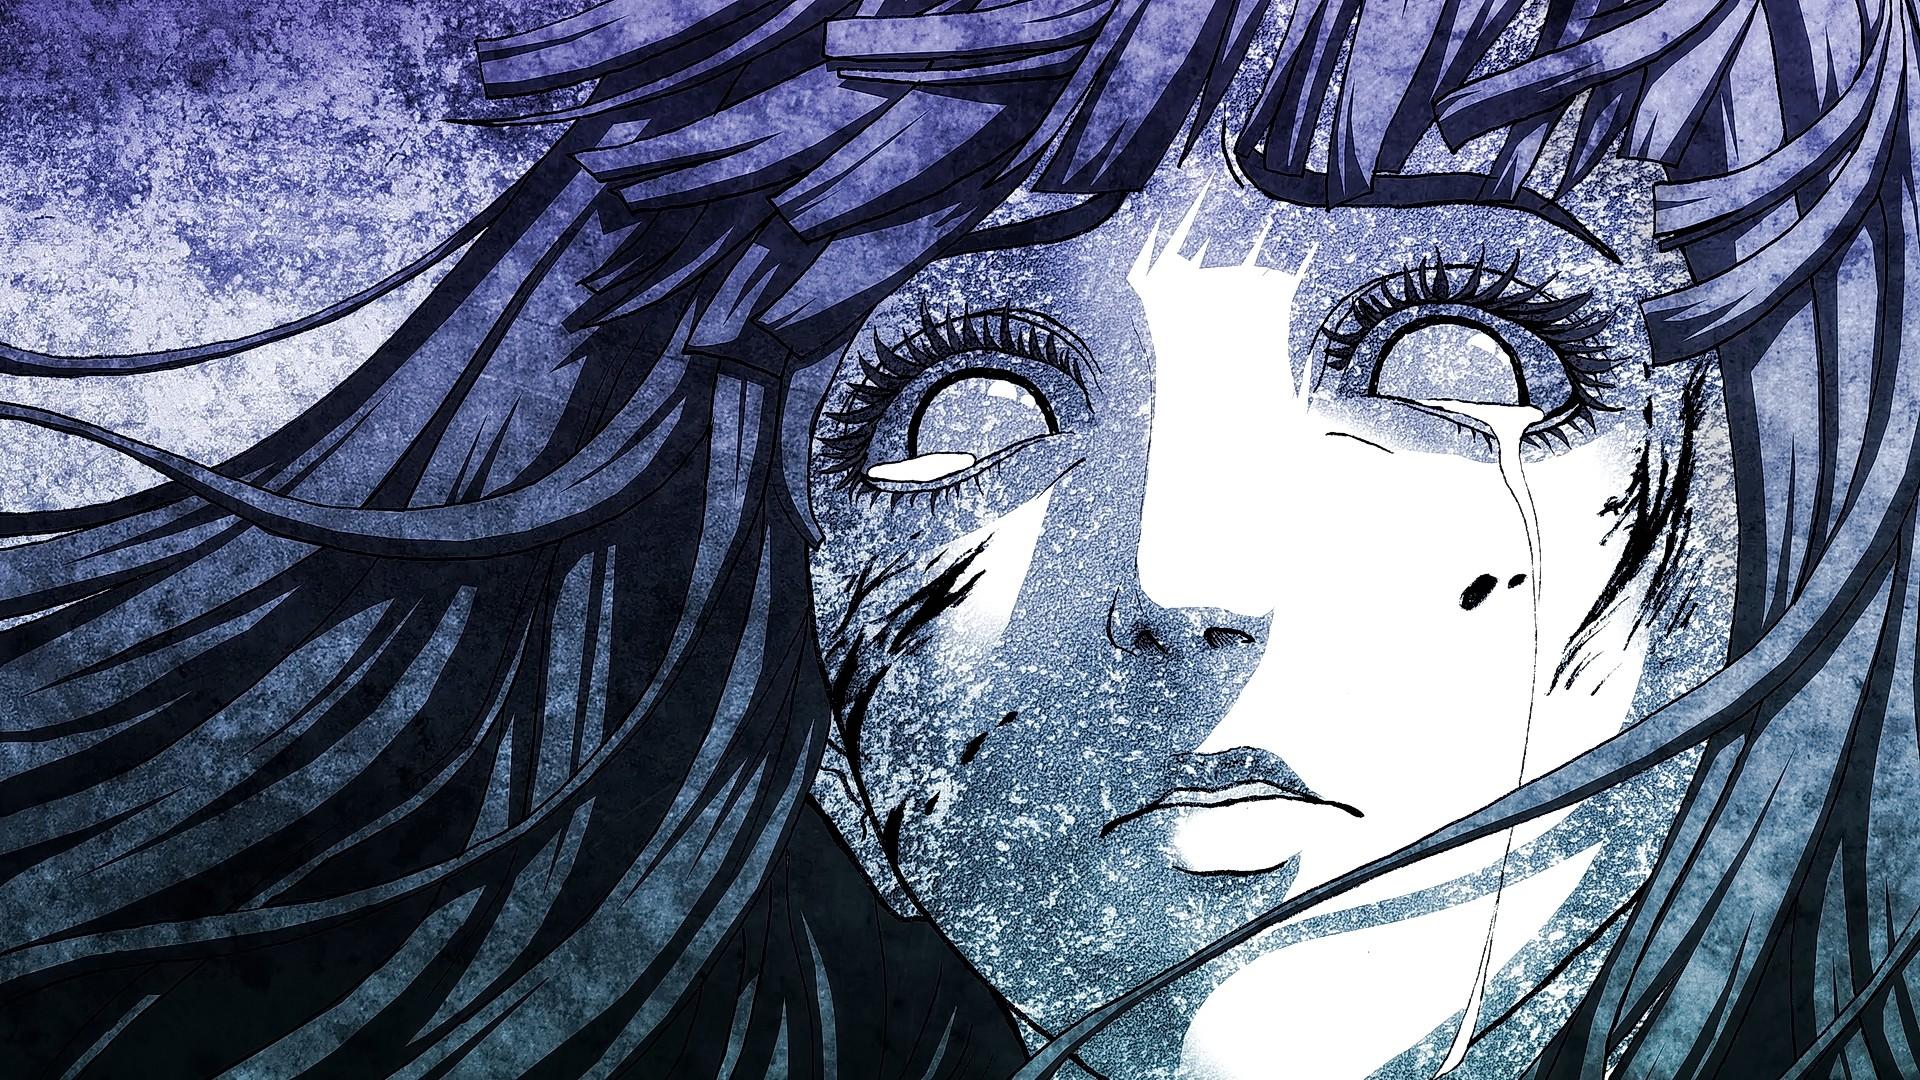 Fond D Ecran Dessin Noir Illustration Monochrome Anime